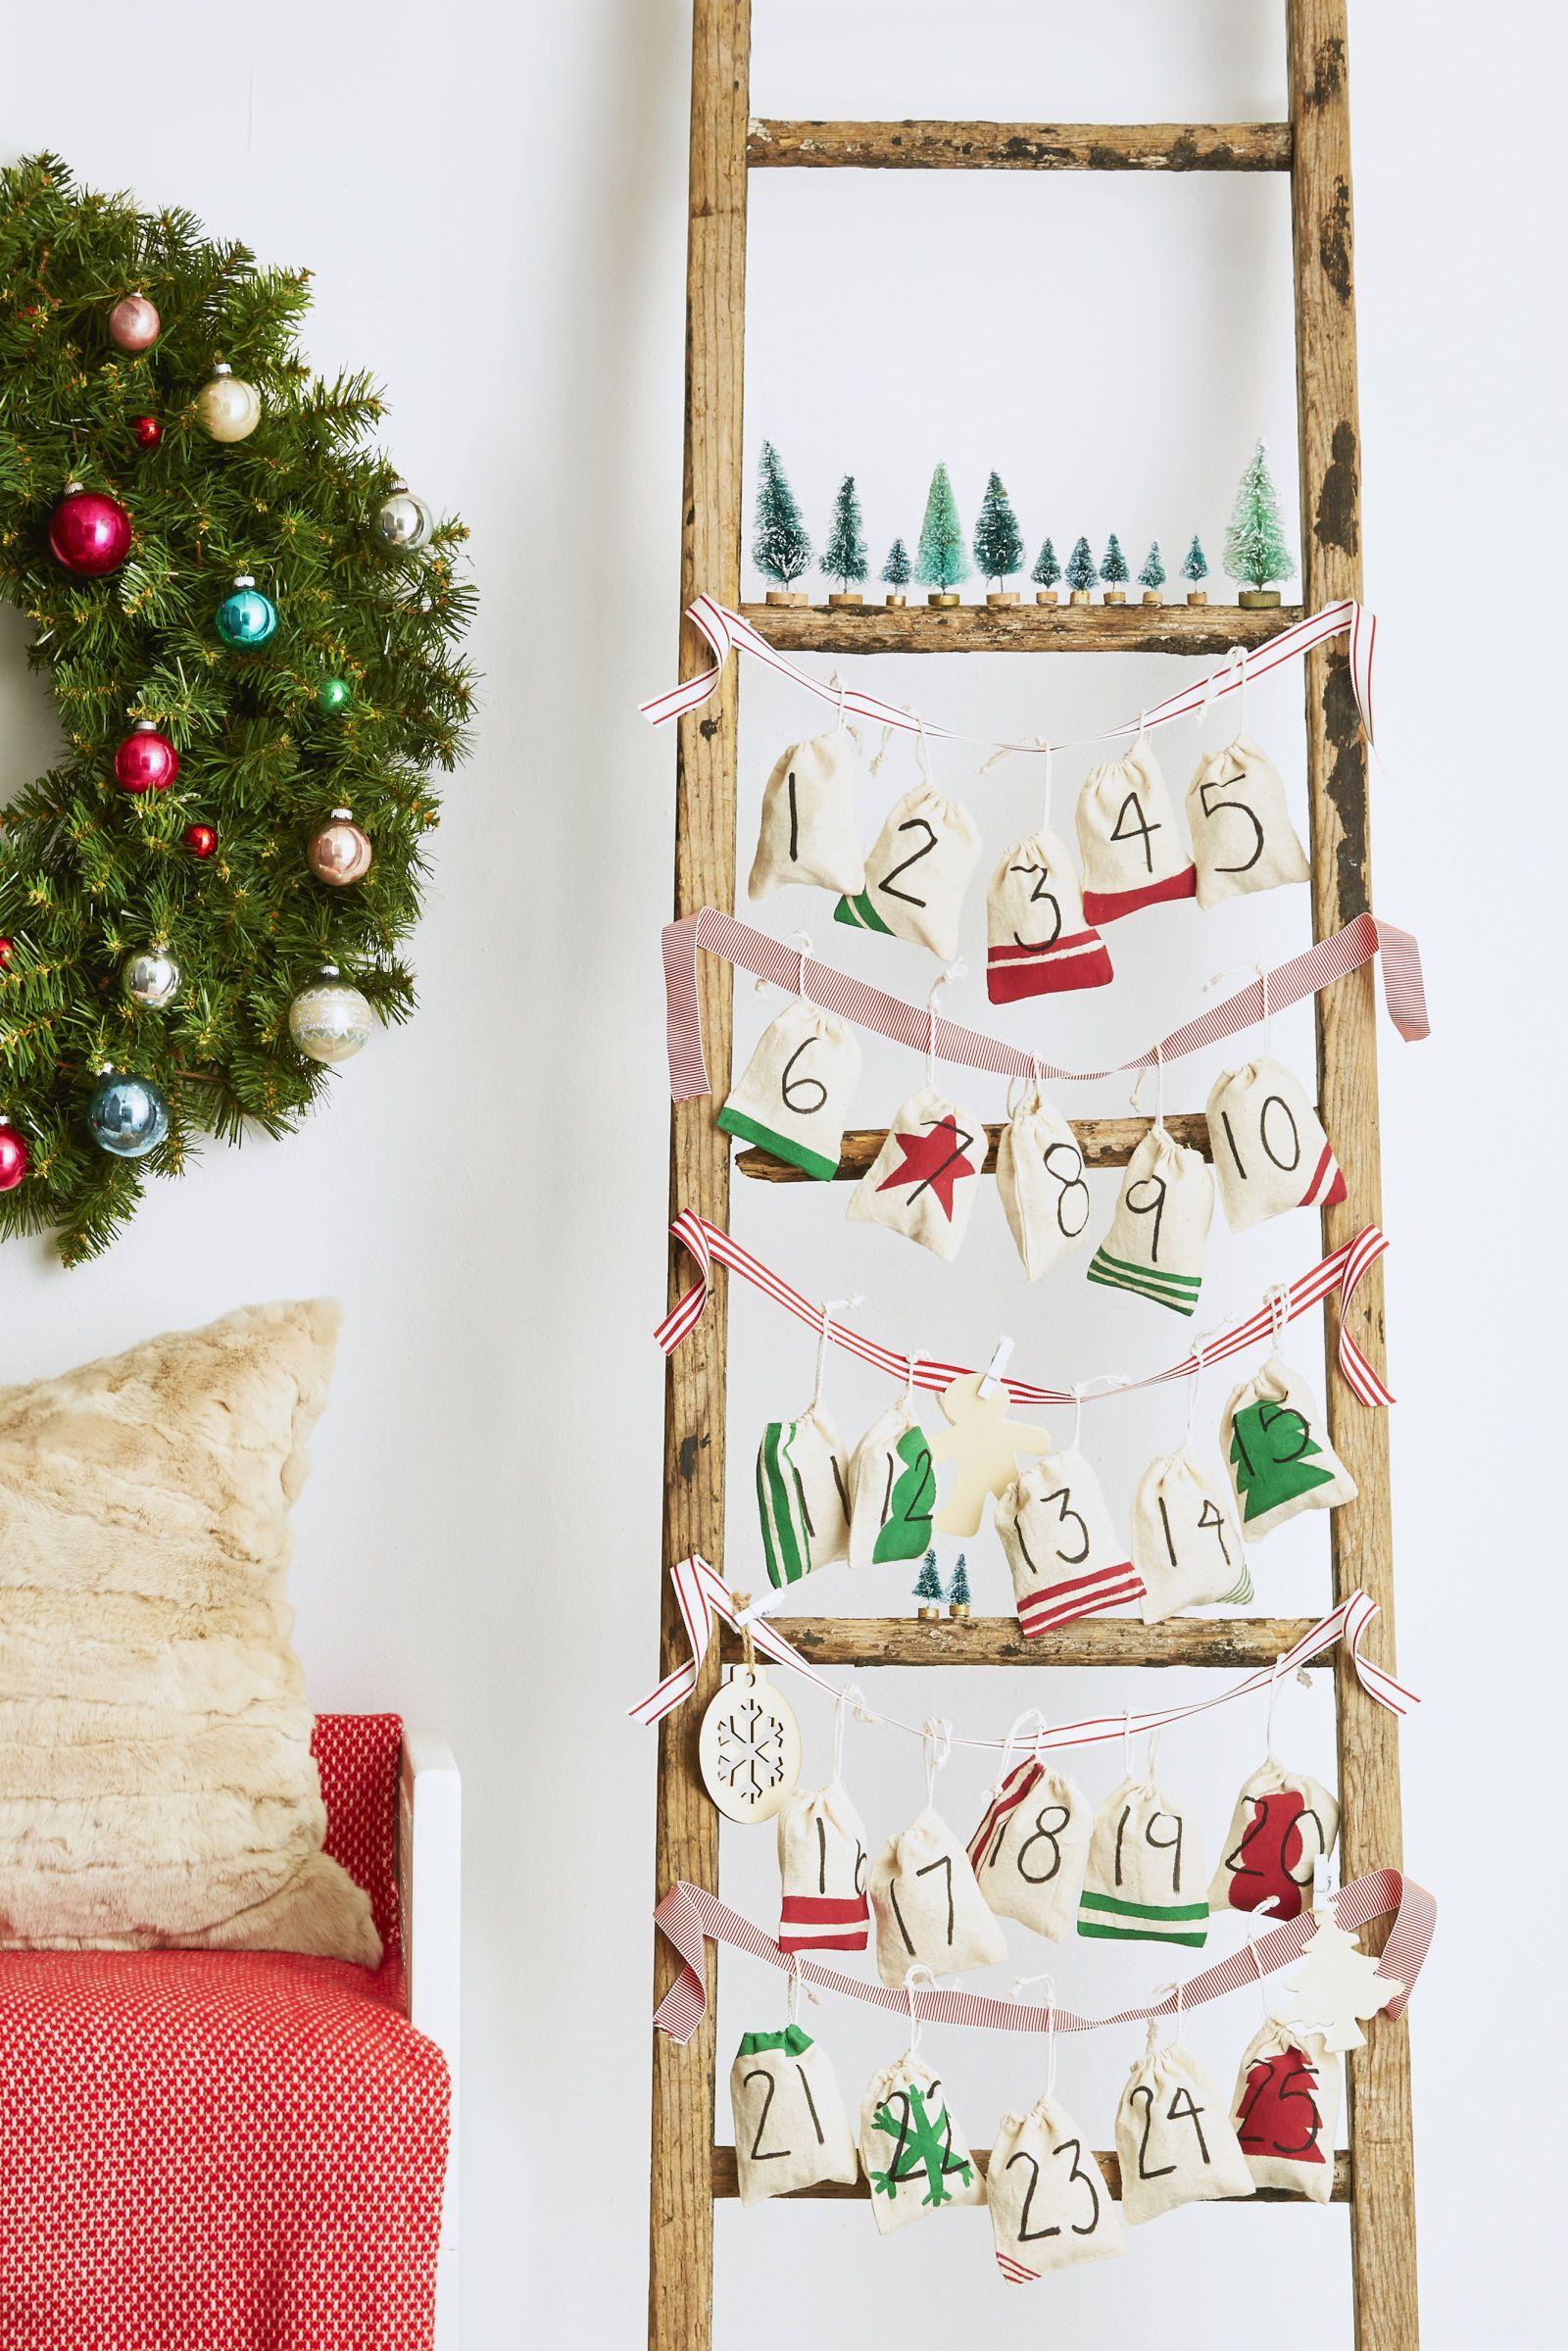 80 Christmas Decorating Ideas for a Joyful Holiday Home | Advent ...